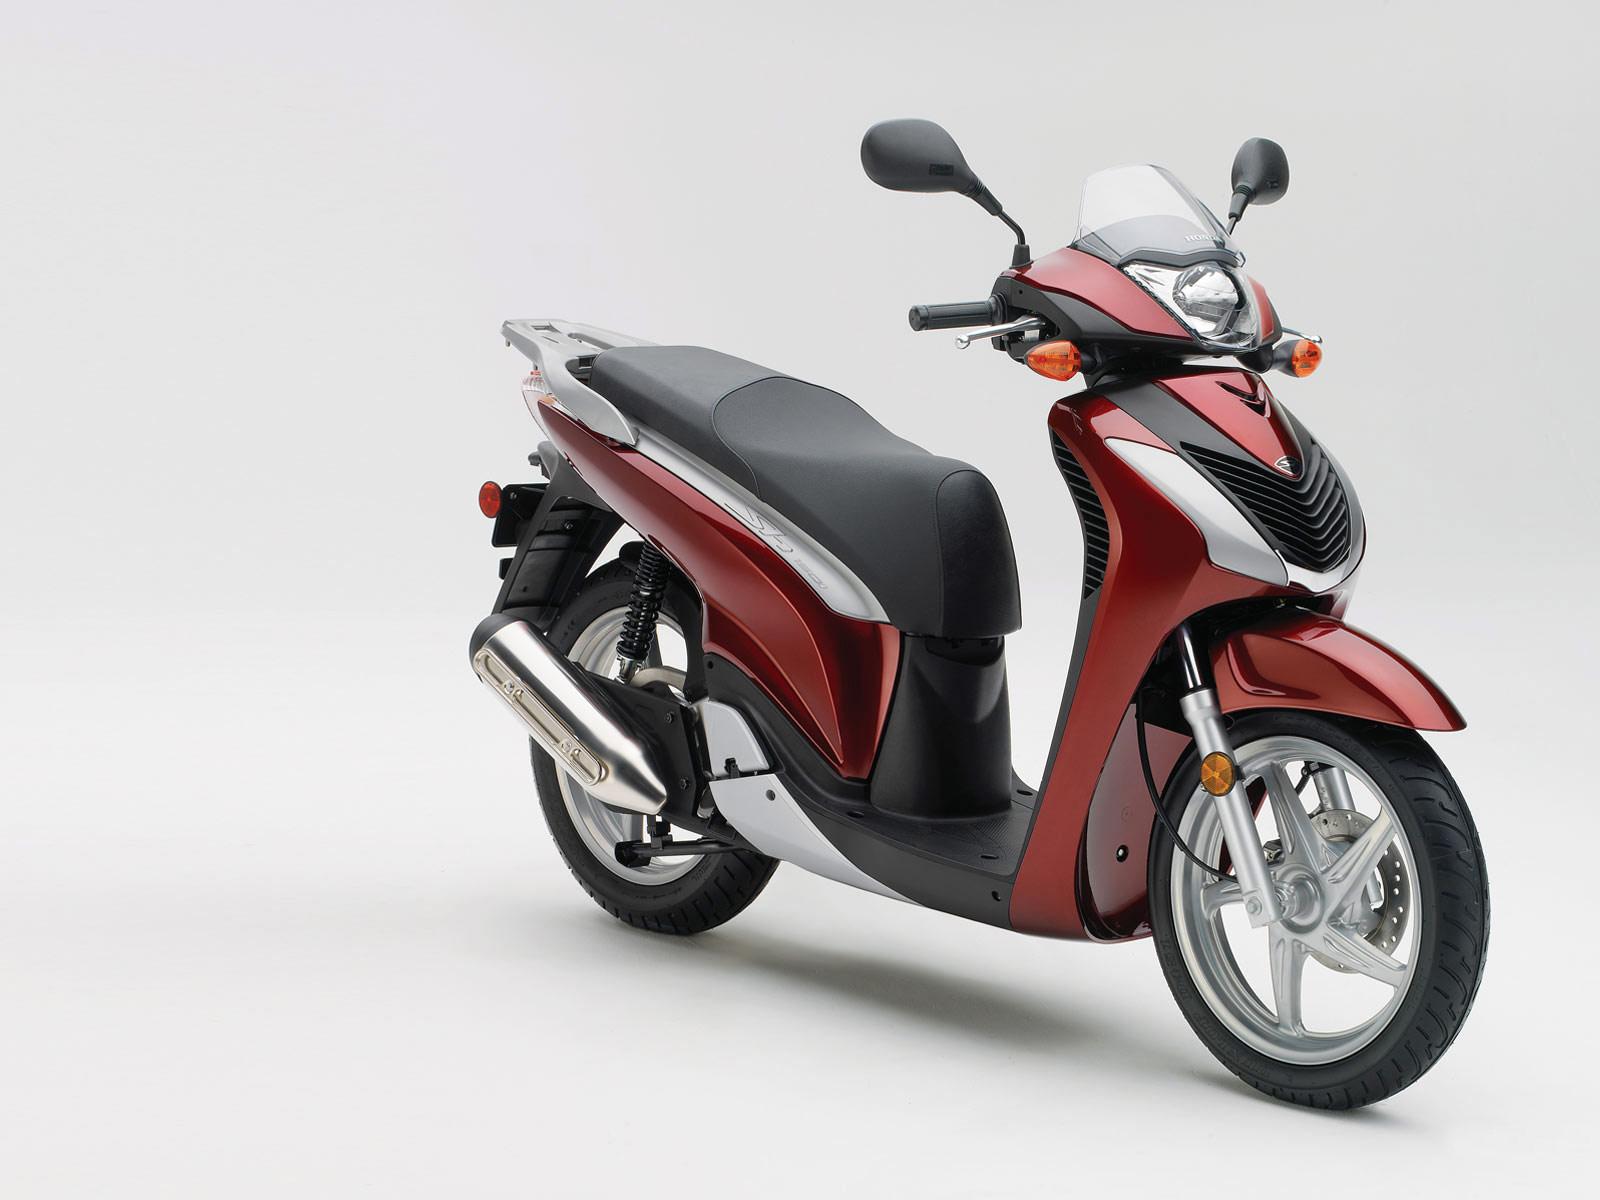 Honda_SH150i_2010_scooterpictures_07.jpg